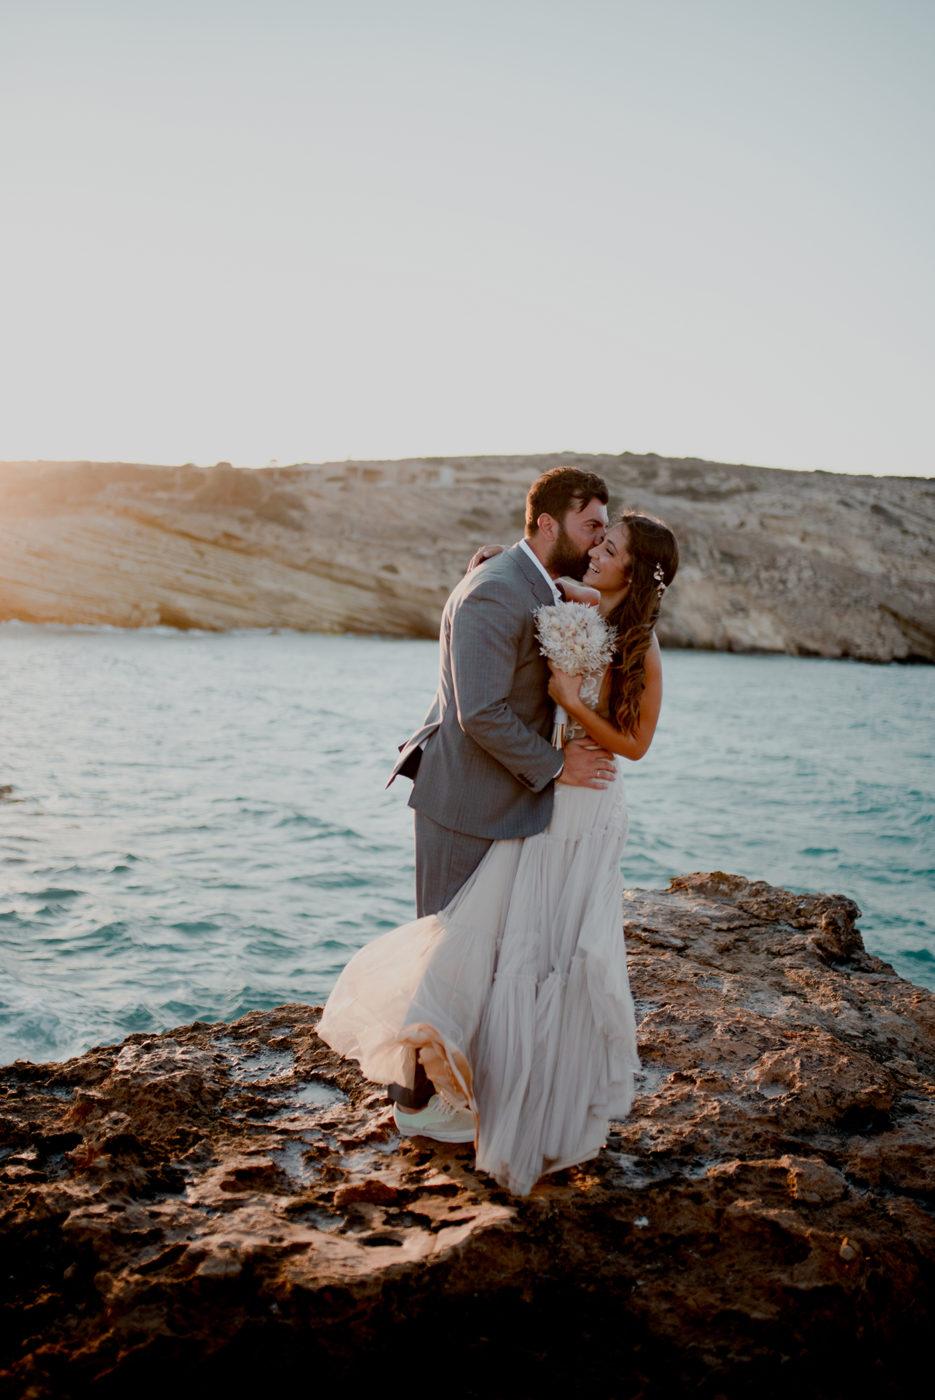 kirill-samarits-wedding-photography-koufonisia-greece-couple-photographer (35)